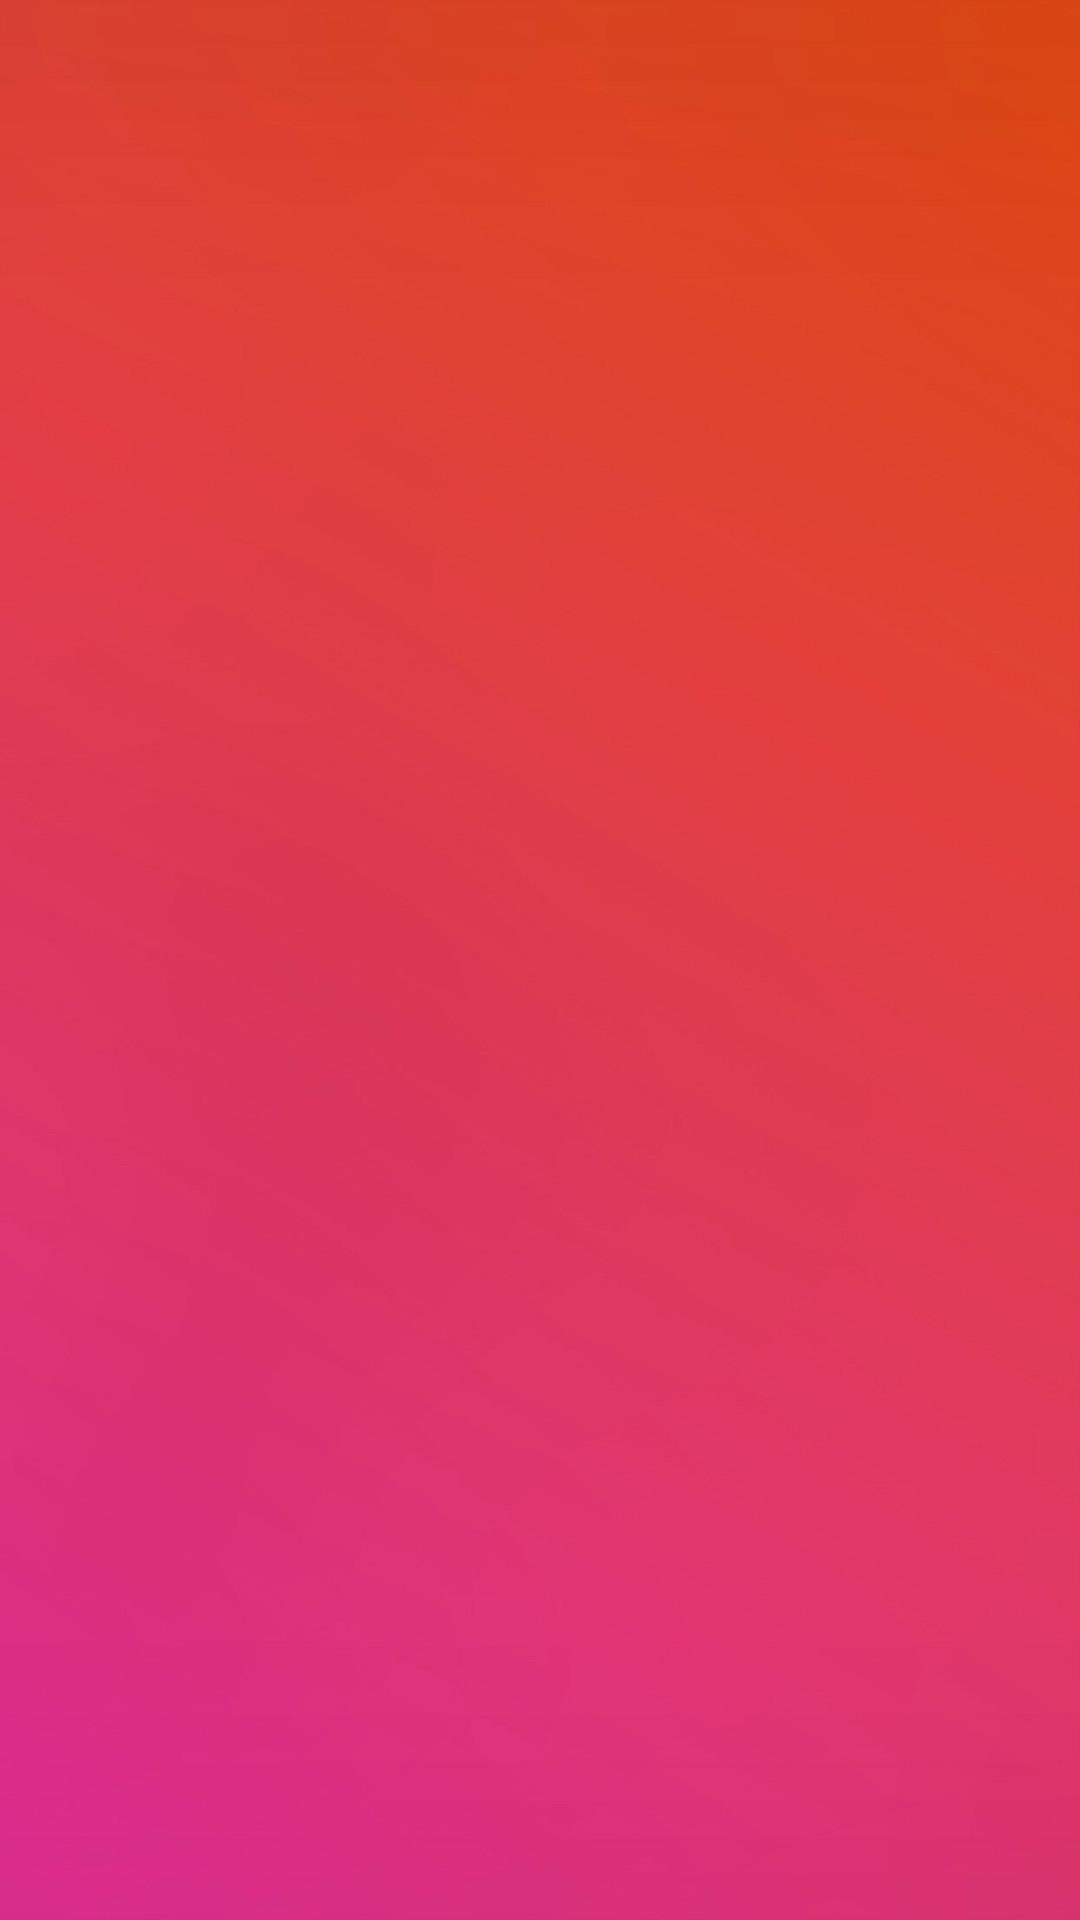 Red Orange Combination Inside Gradation Blur iPhone 6 wallpaper